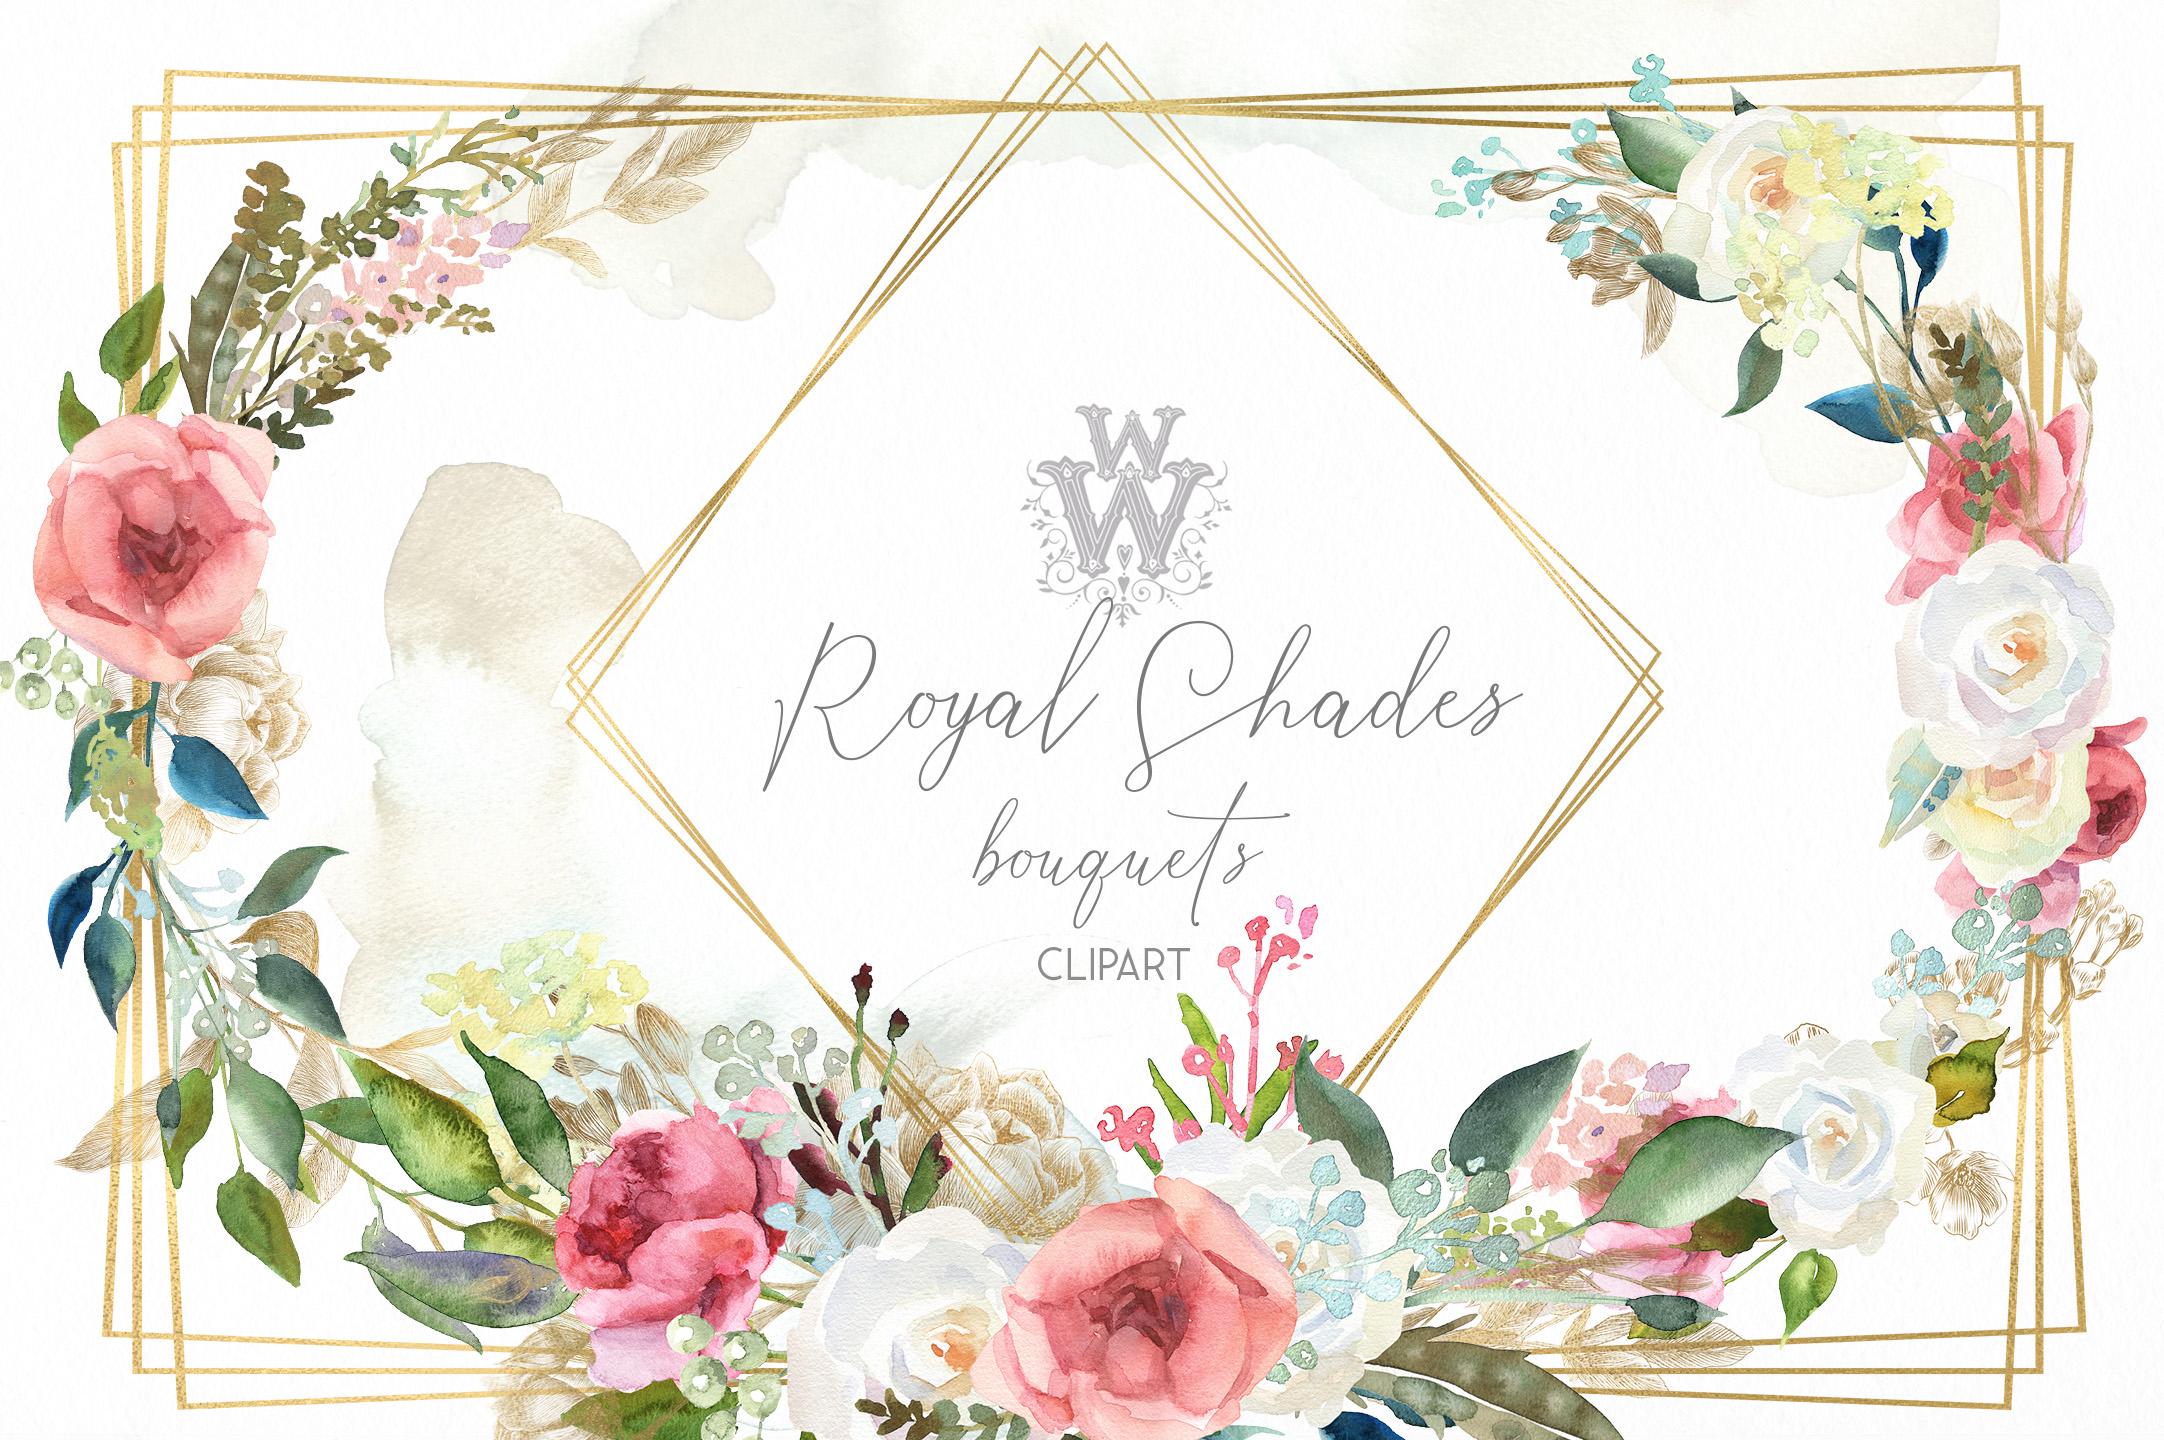 Watercolor rustic wedding bouquets clipart, vintage wreath example image 7